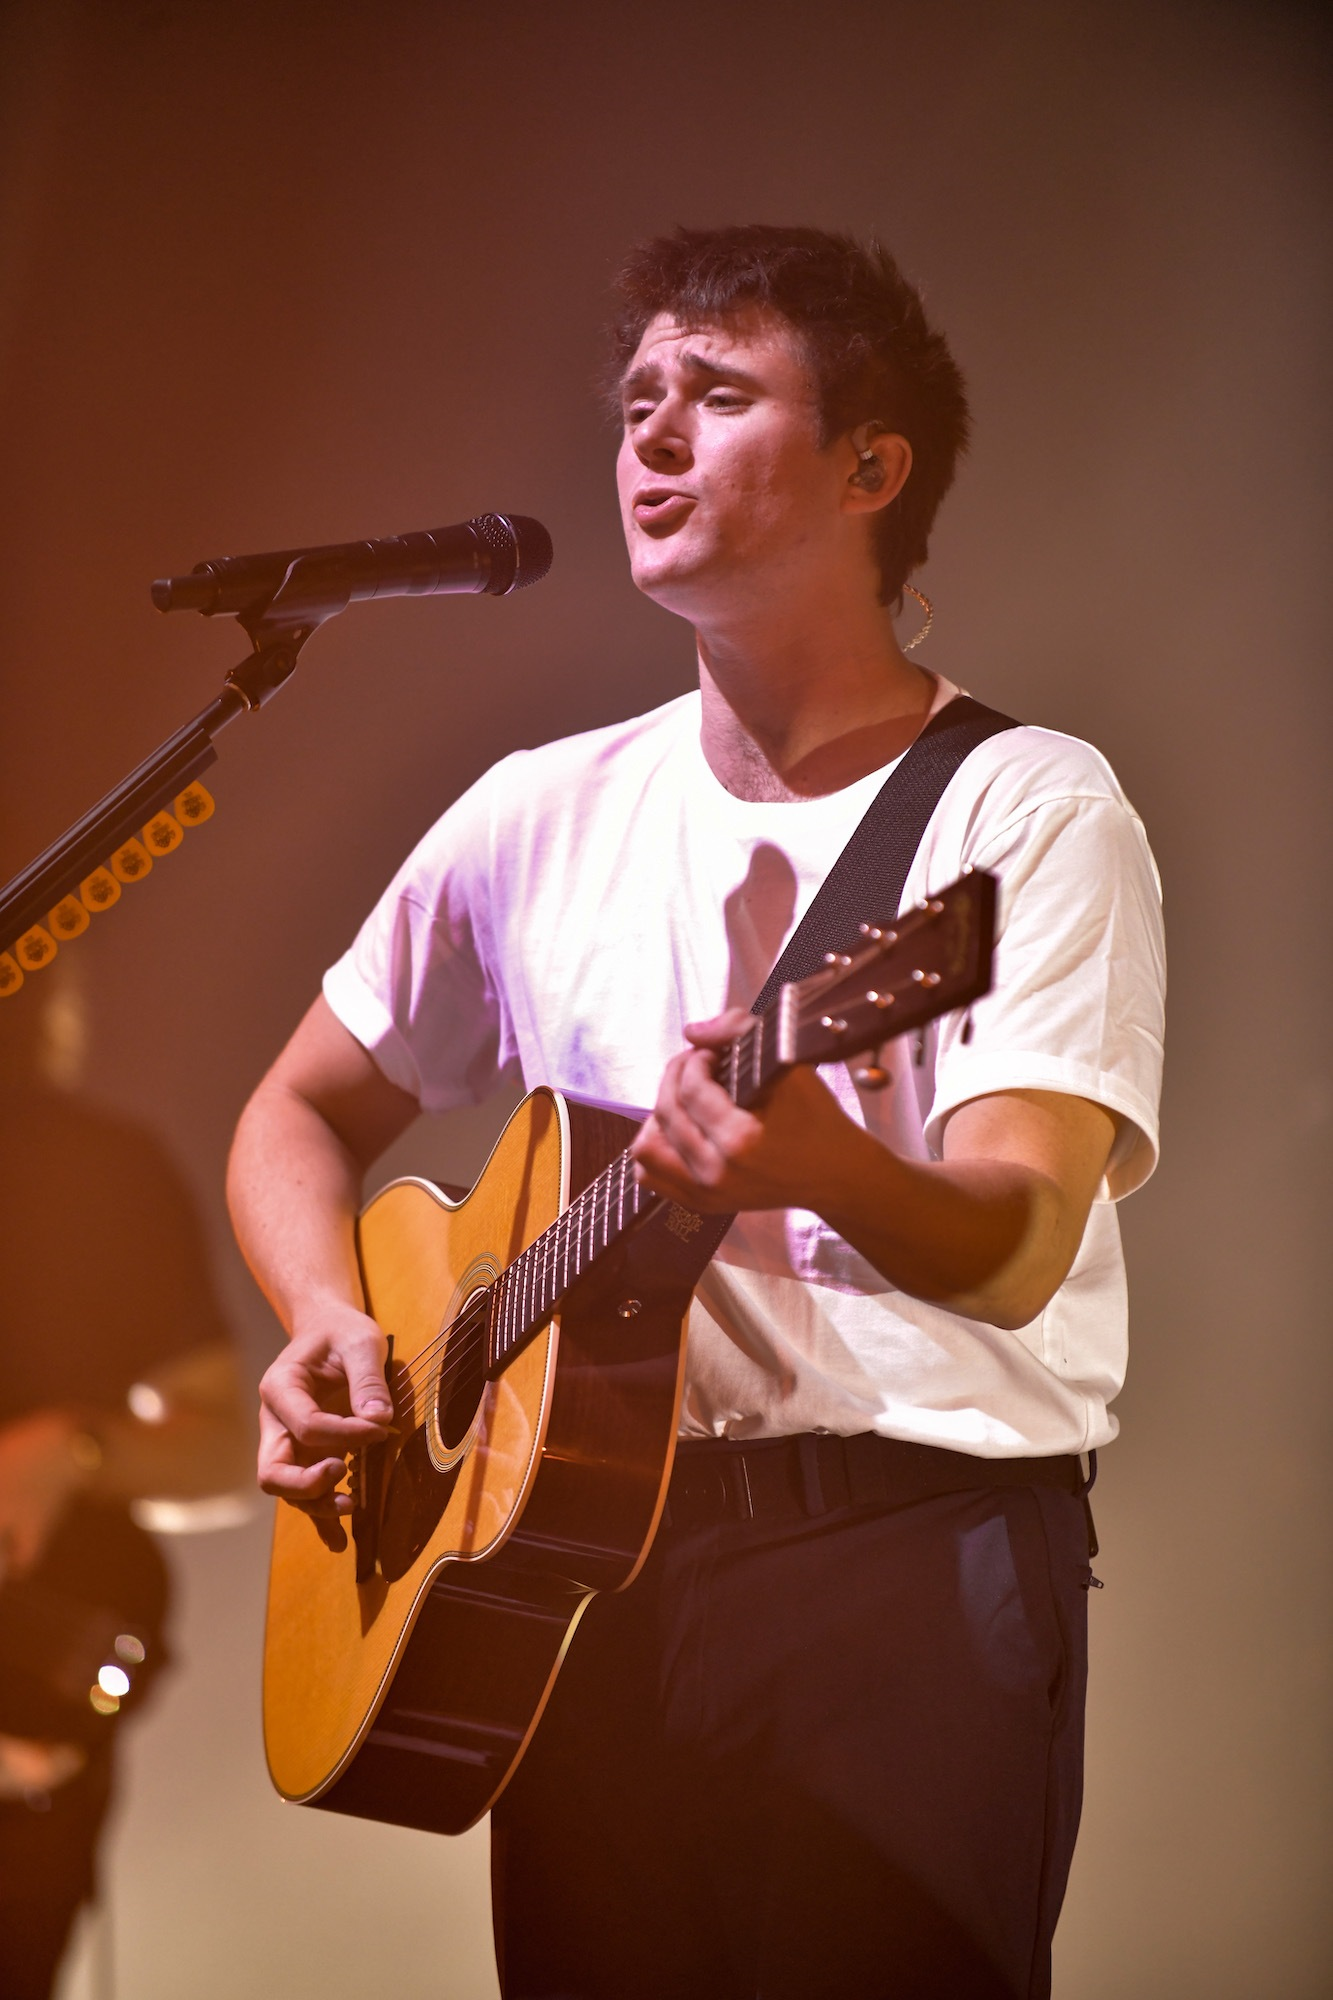 Alec Benjamin Live at Riviera [GALLERY] 16